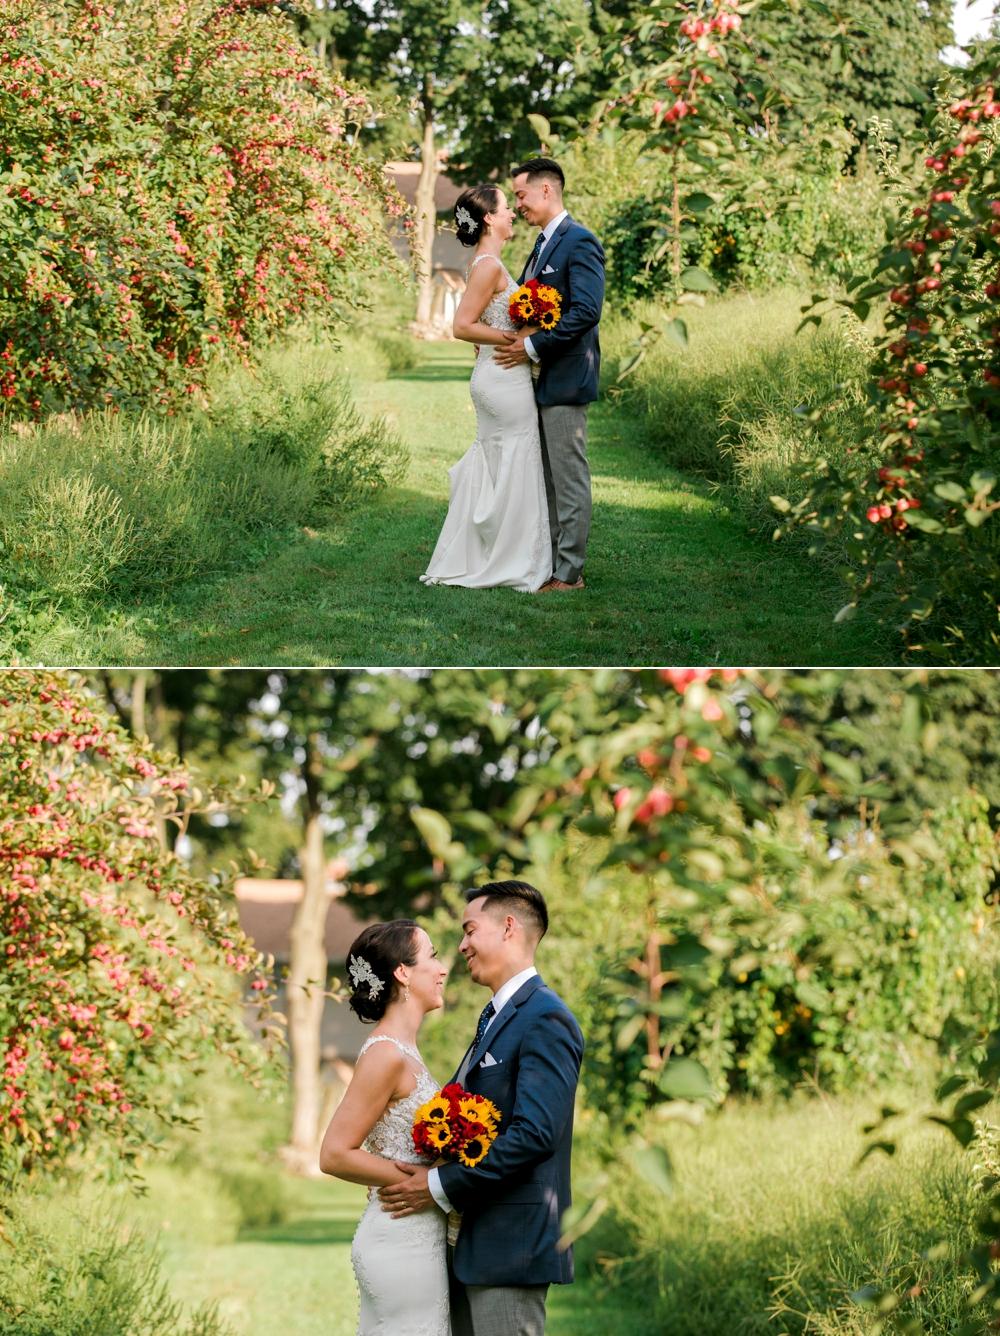 SomerbyJonesPhotography__SmithBarnWedding_SmithBarn_WeddingatSmithBarn_0033.jpg